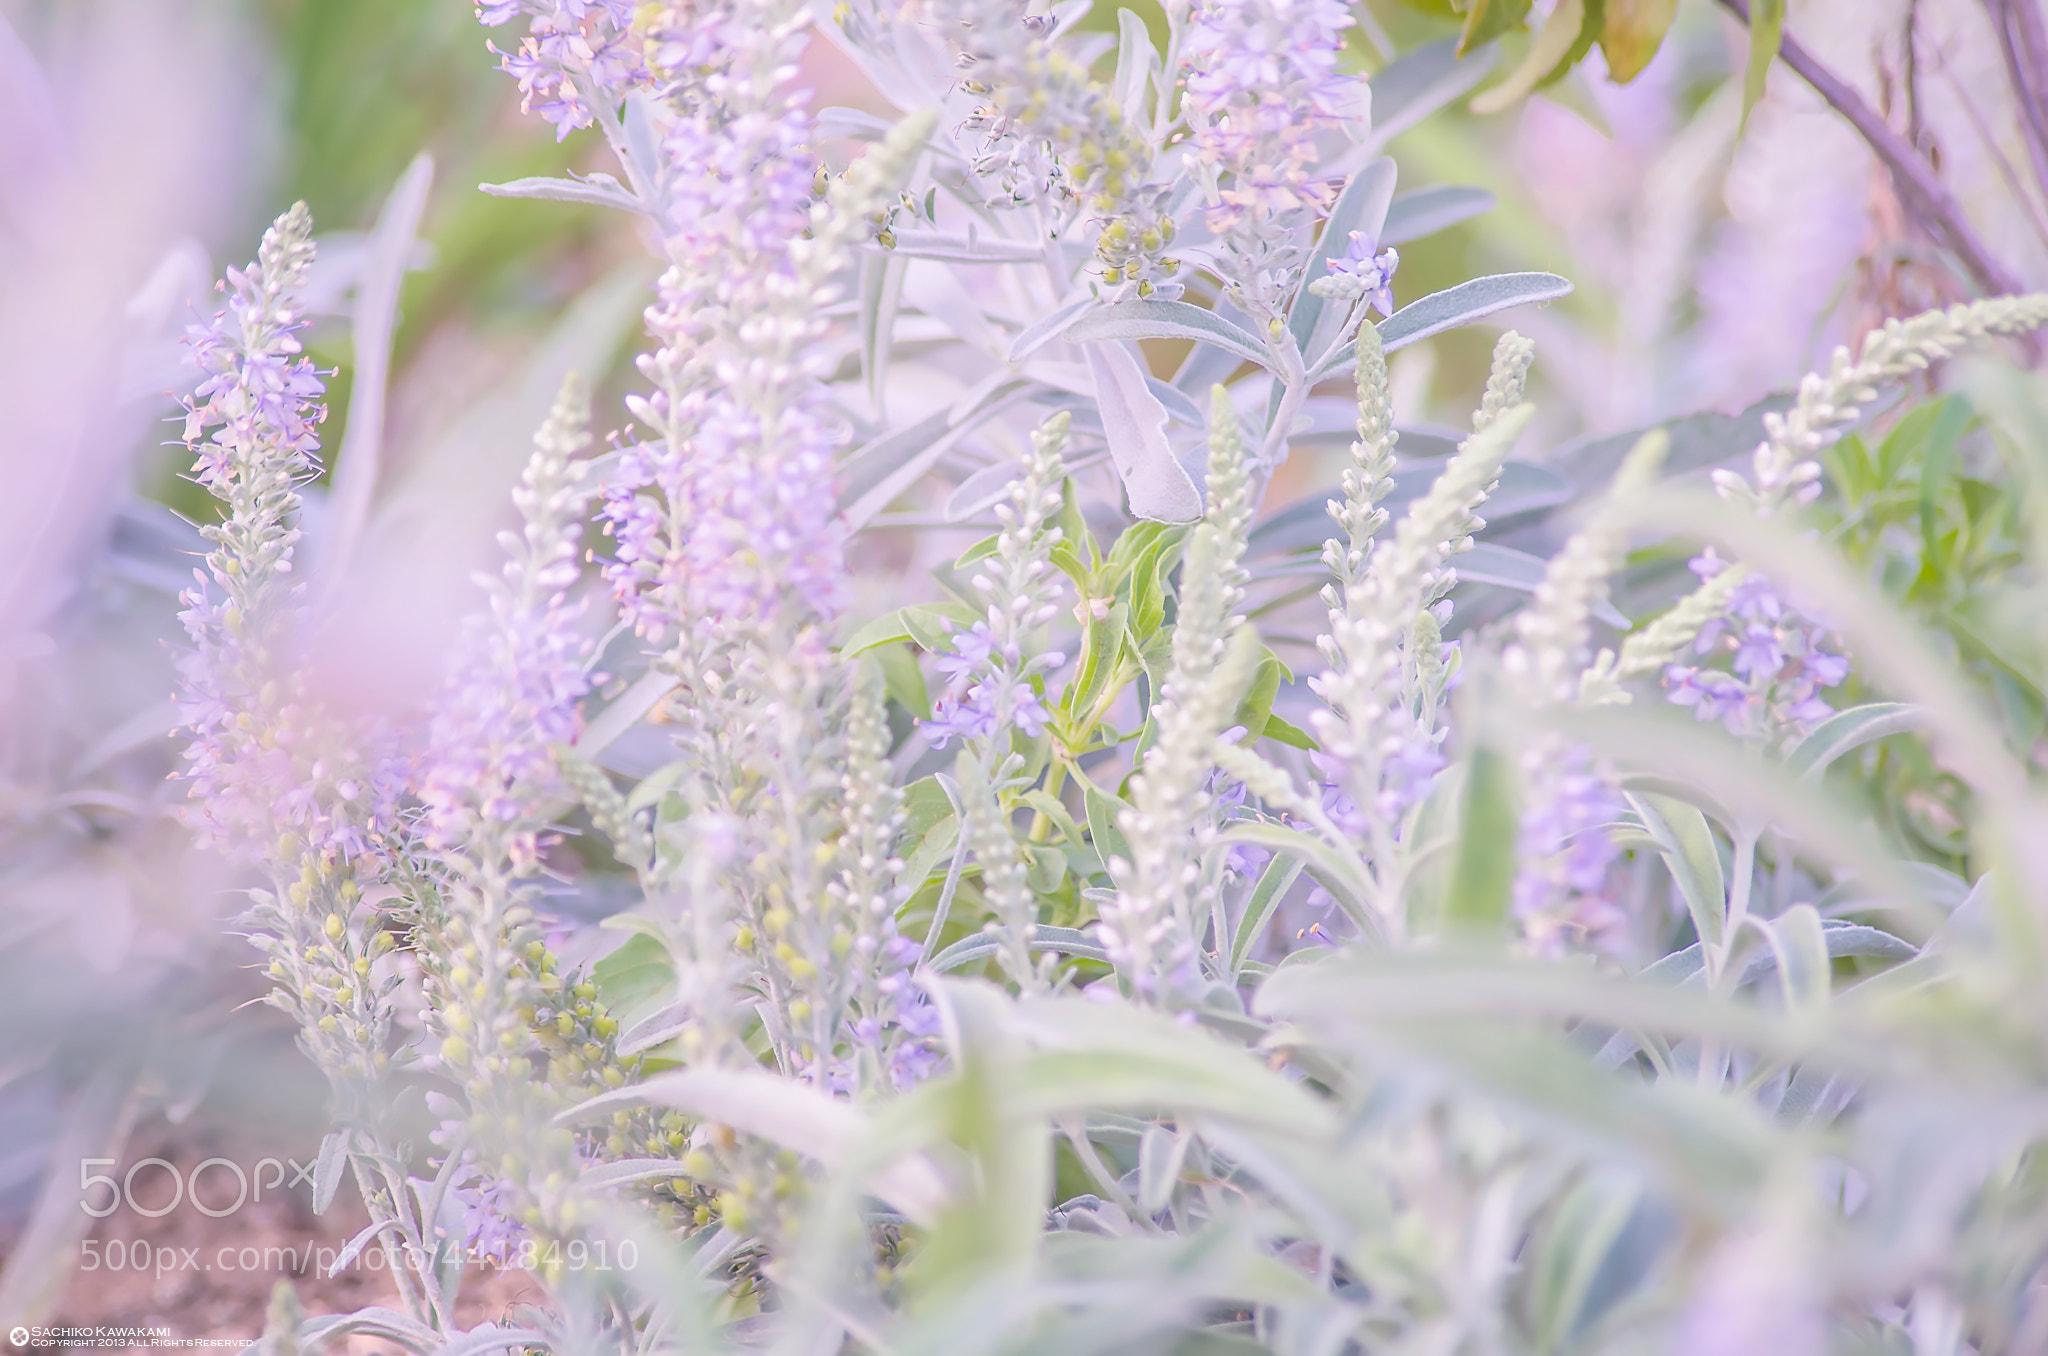 Photograph Tenderness by Sachiko Kawakami on 500px